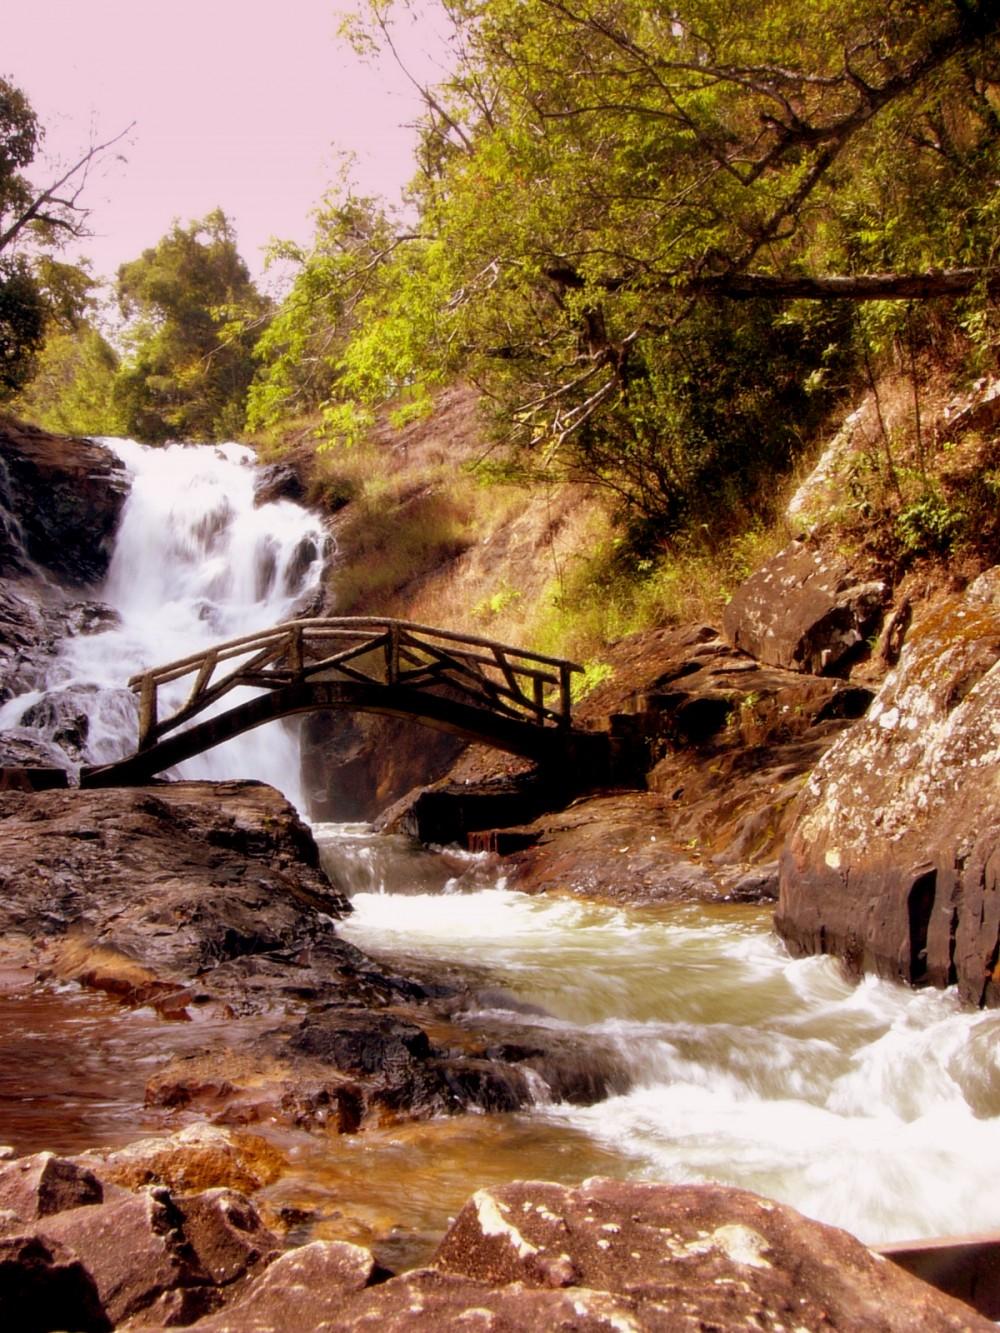 Waterfall in Vietnam